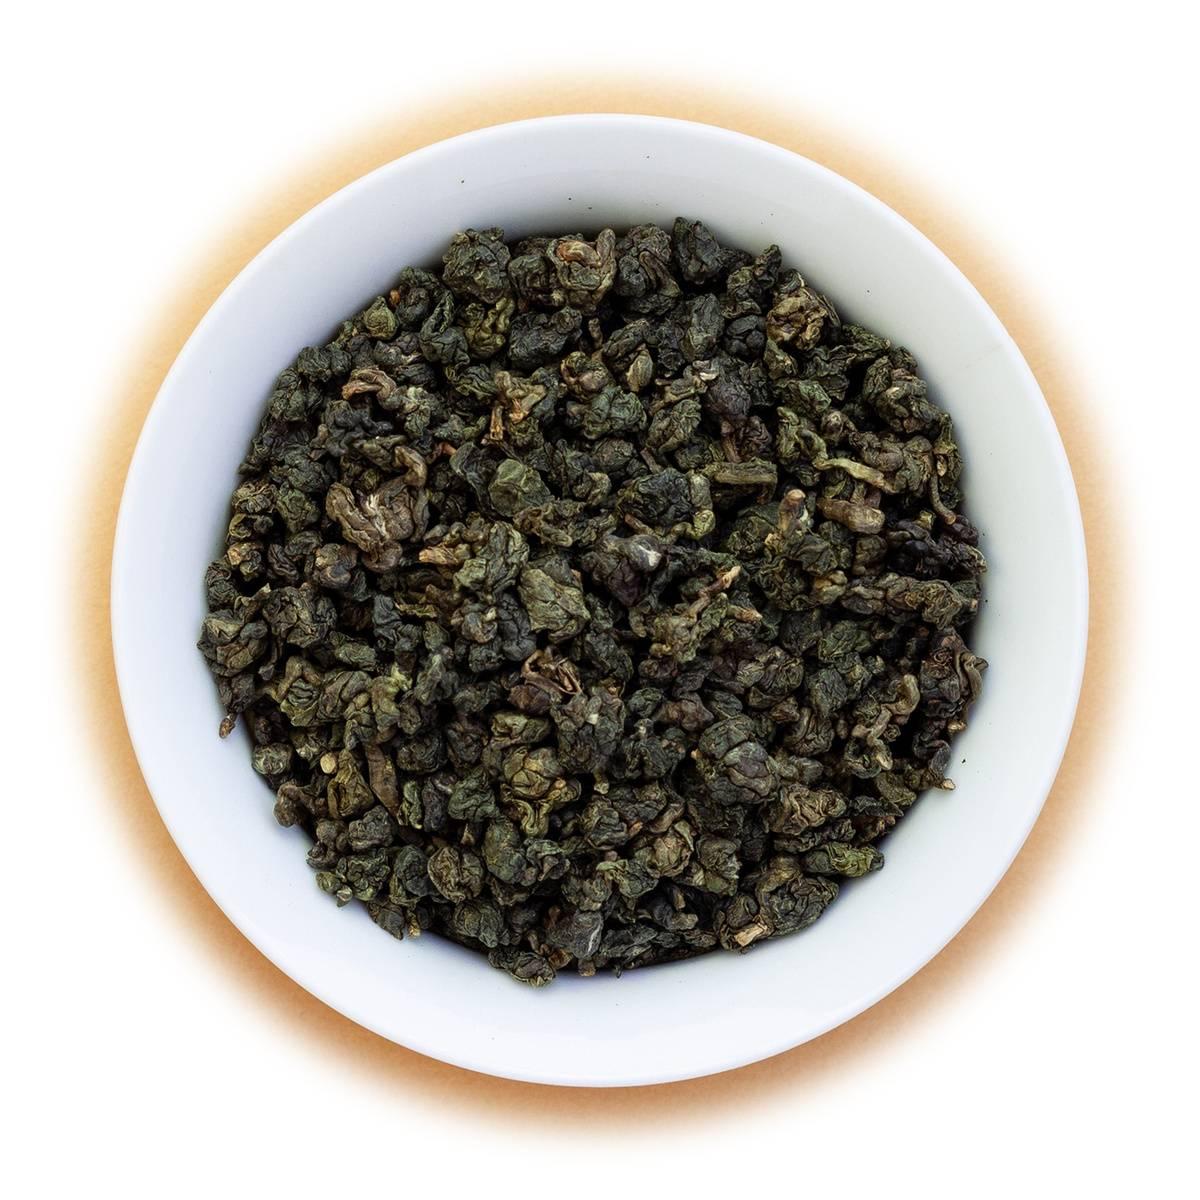 Алишань улун – тайваньский чай с изысканным вкусом